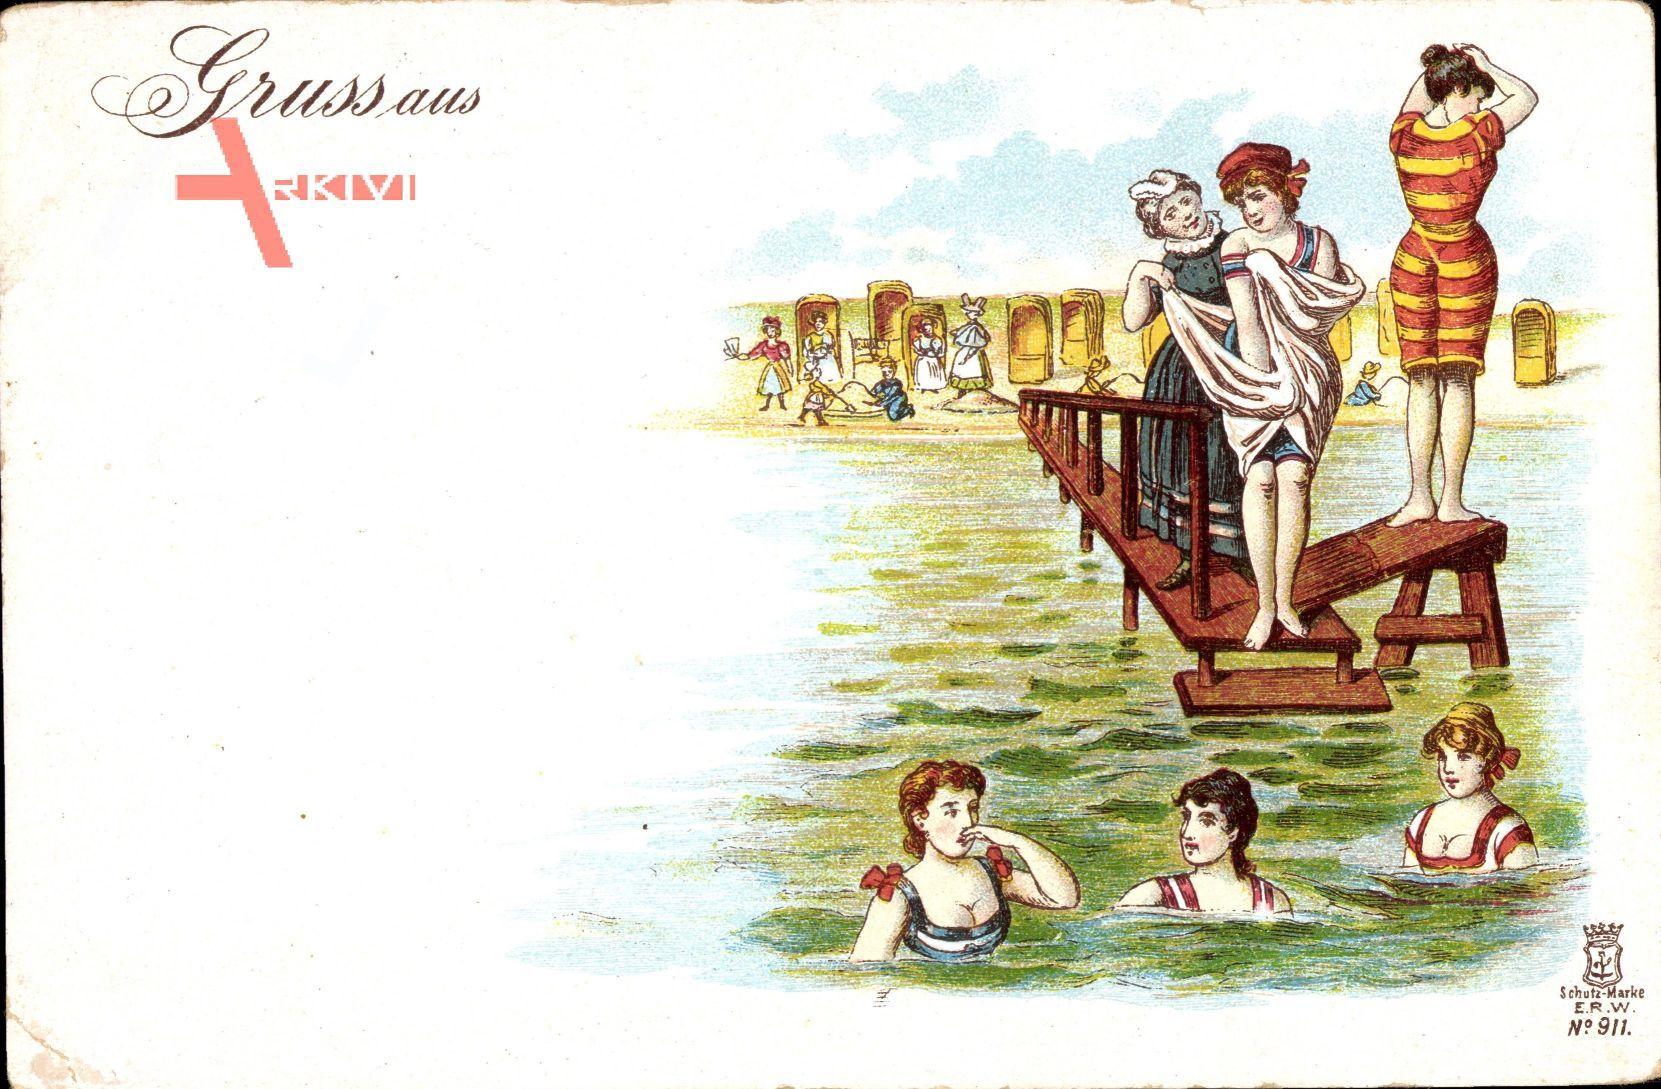 Frauenstrand, Mädchen in Badekleidern, Steg, Strandkörbe